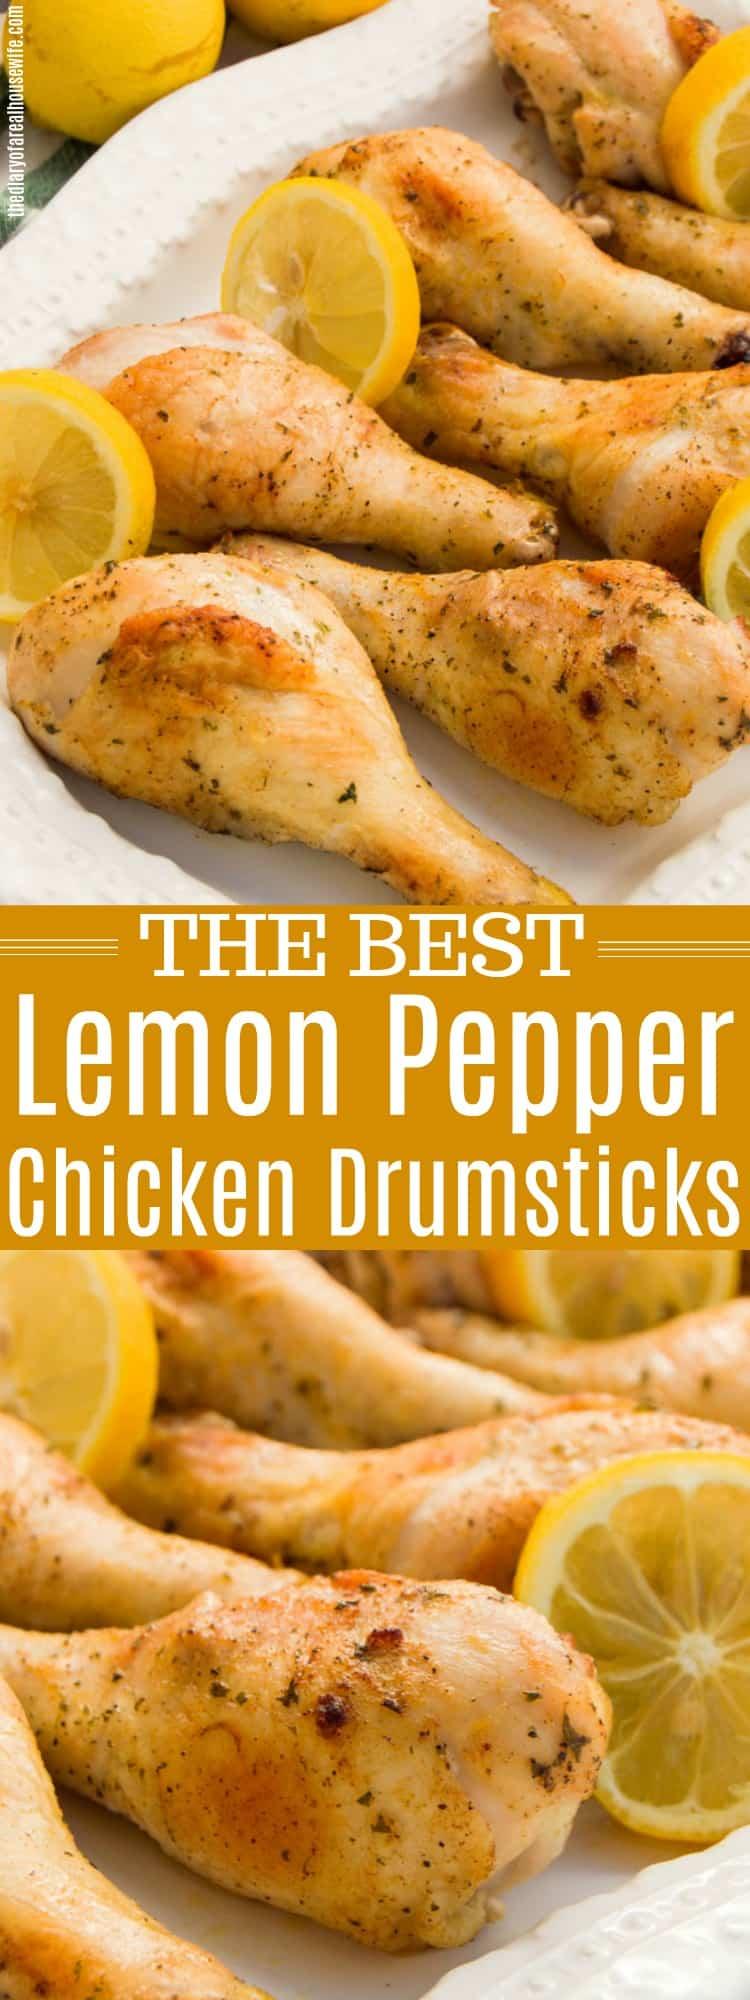 Lemon Pepper Chicken Drumsticks